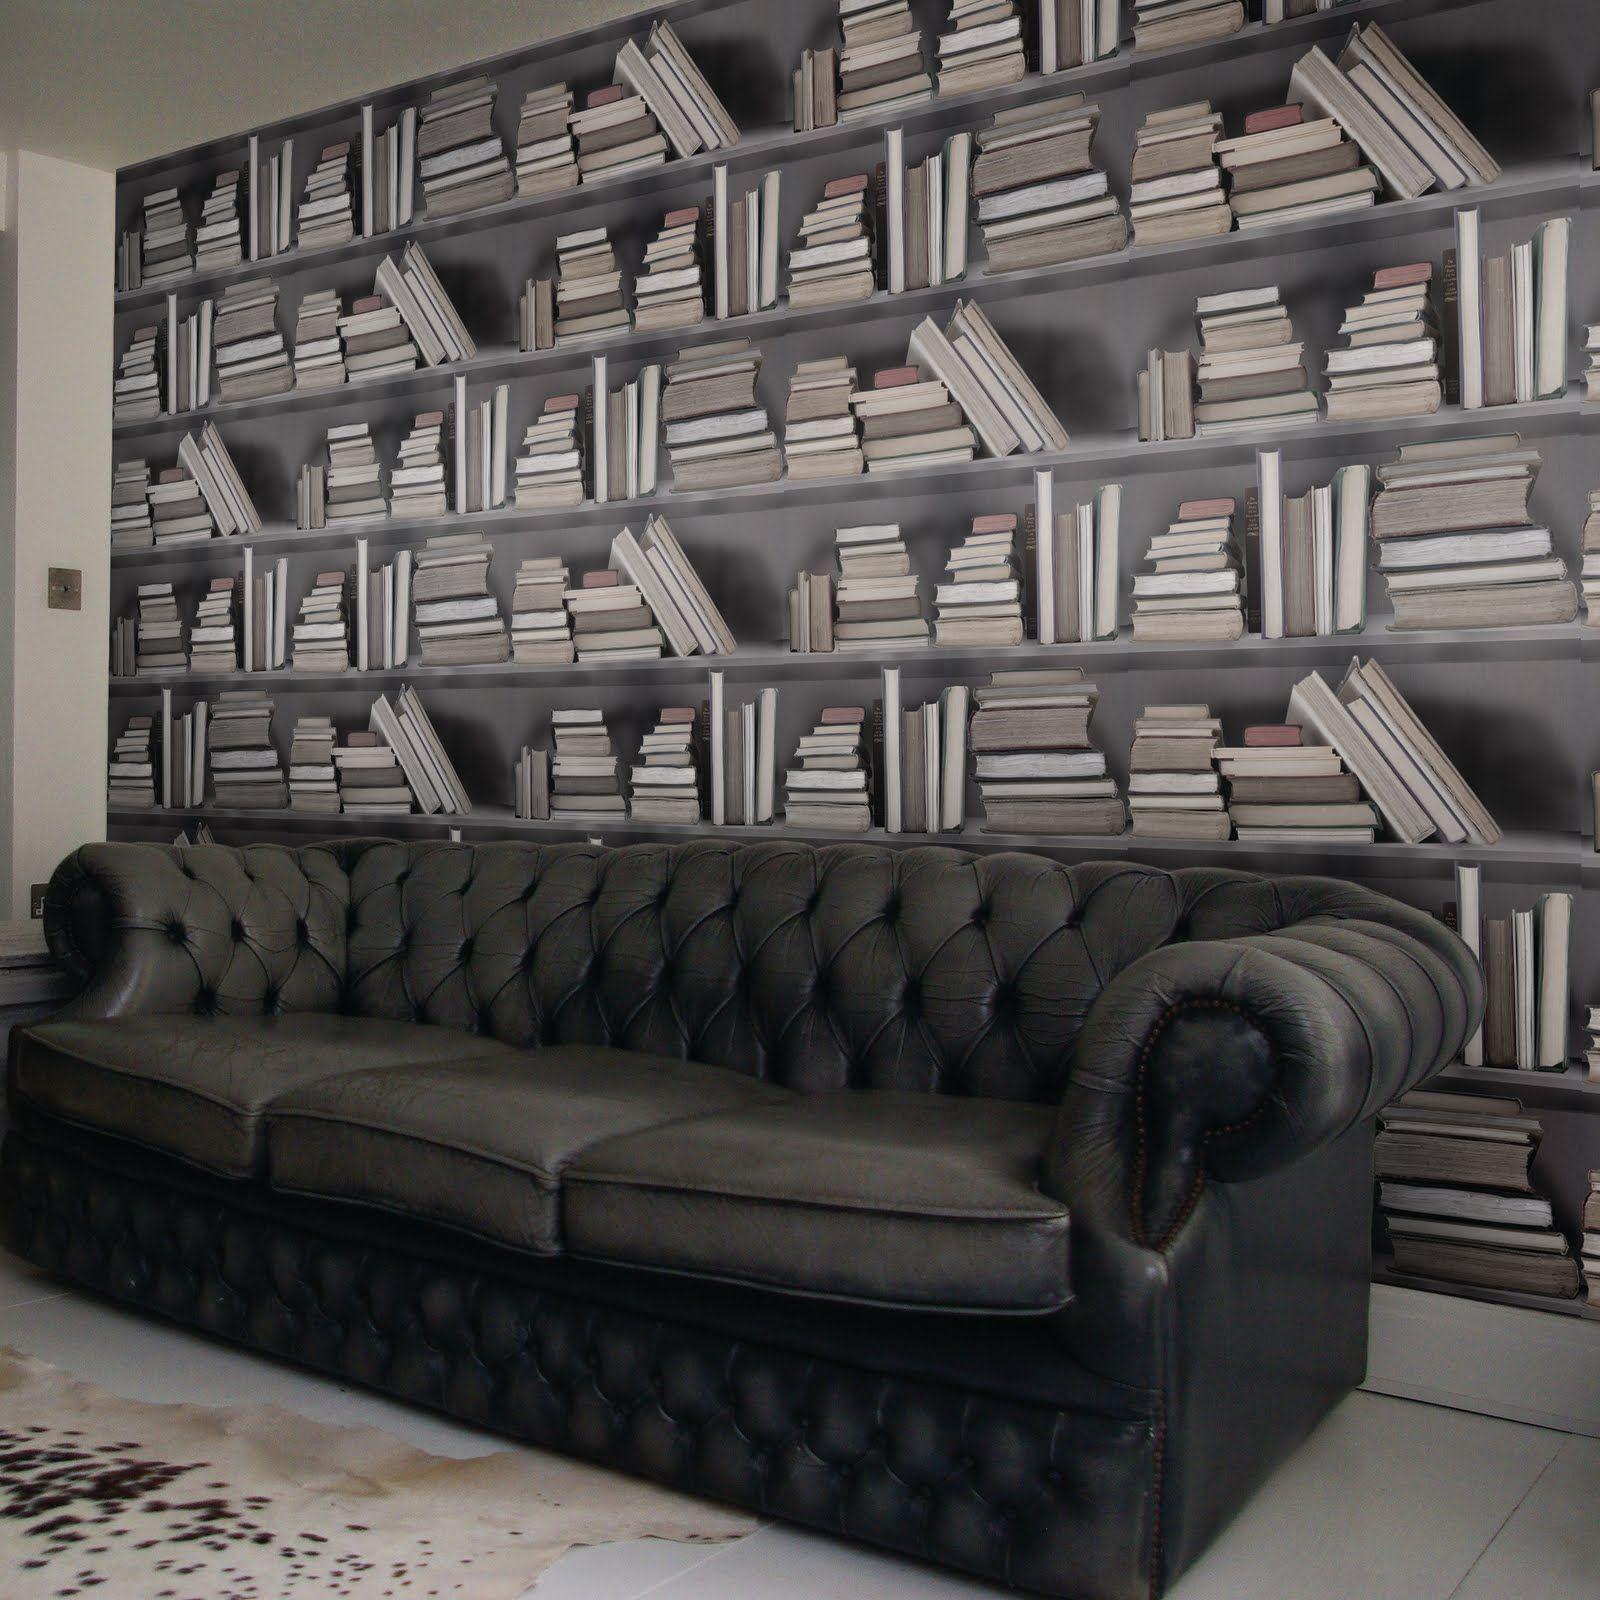 Bookshelf Wallpaper A Chesterfield Looks Like My Dream